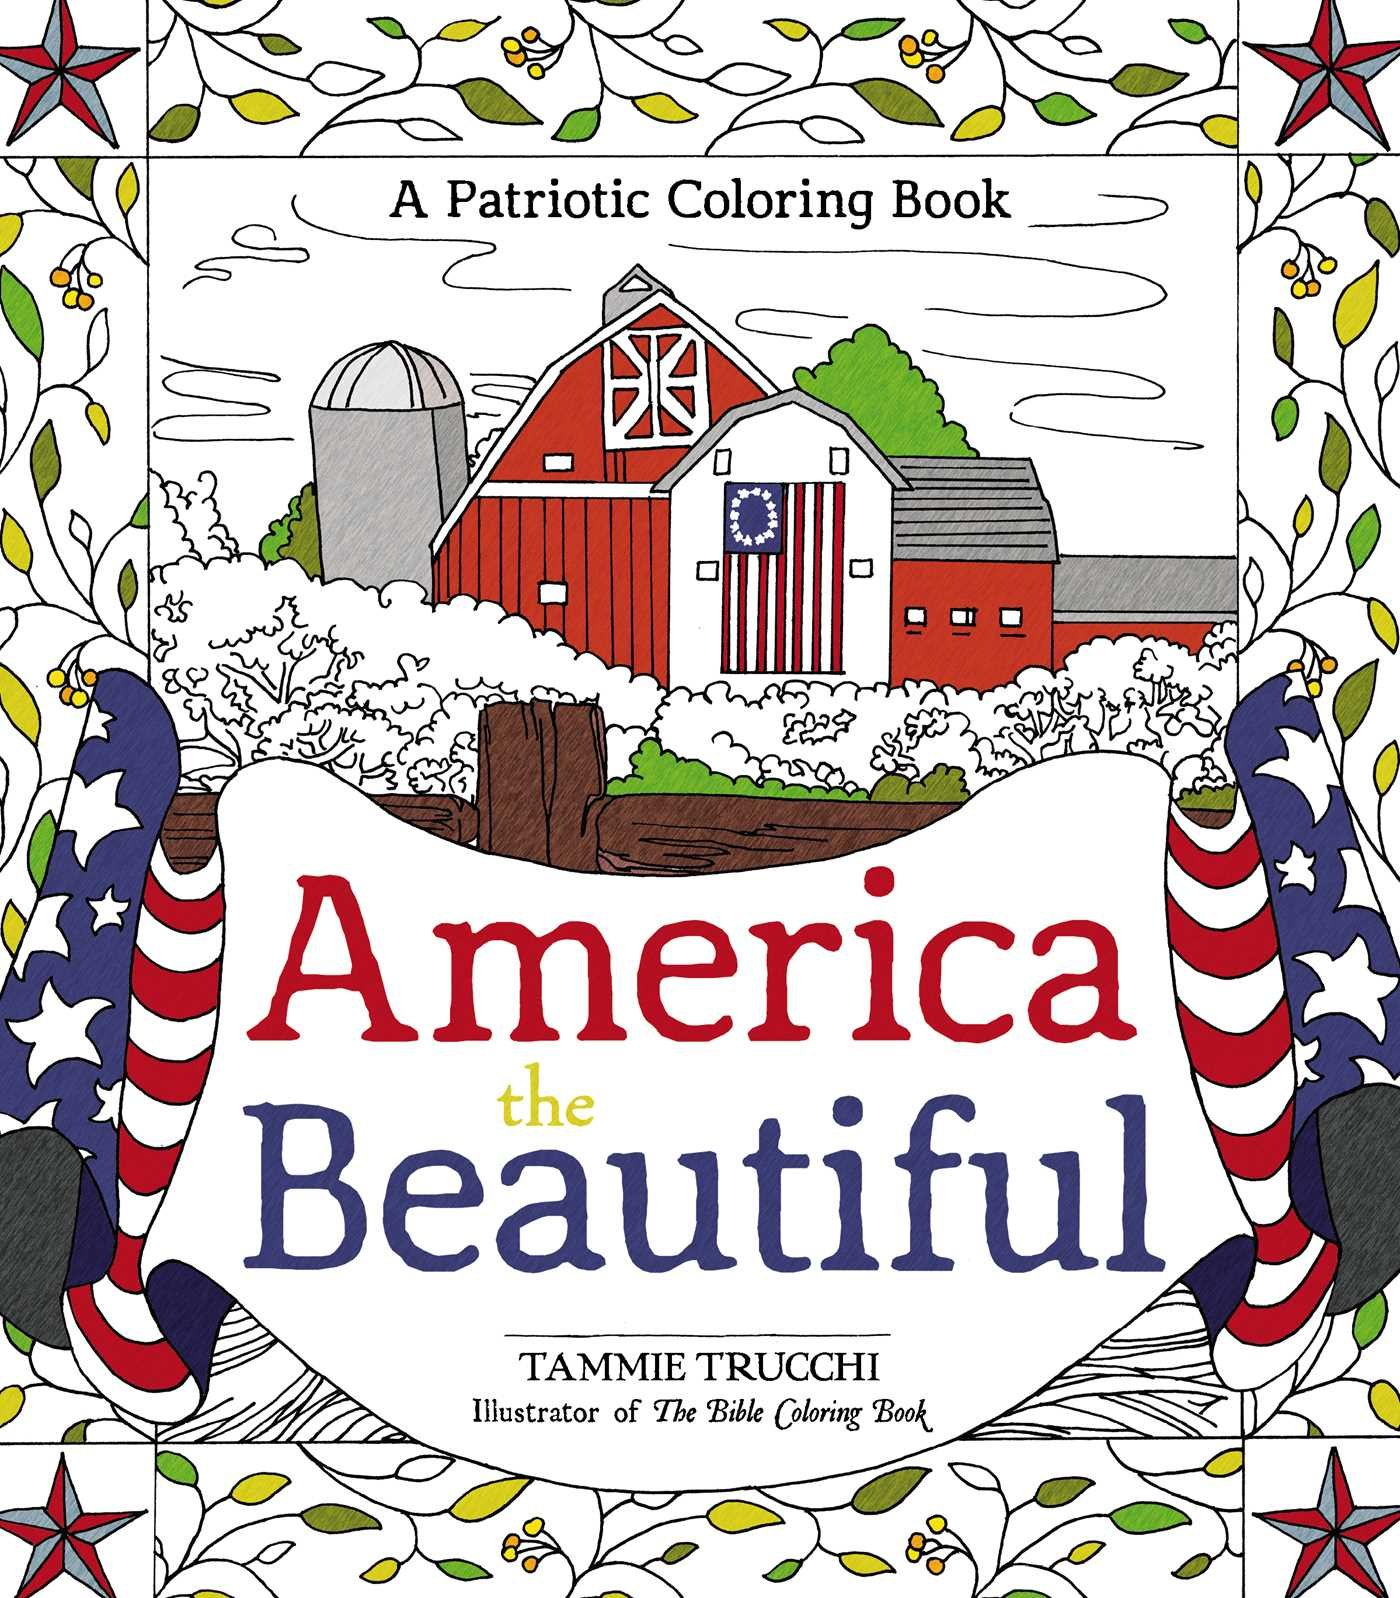 America the Beautiful: A Patriotic Coloring Book